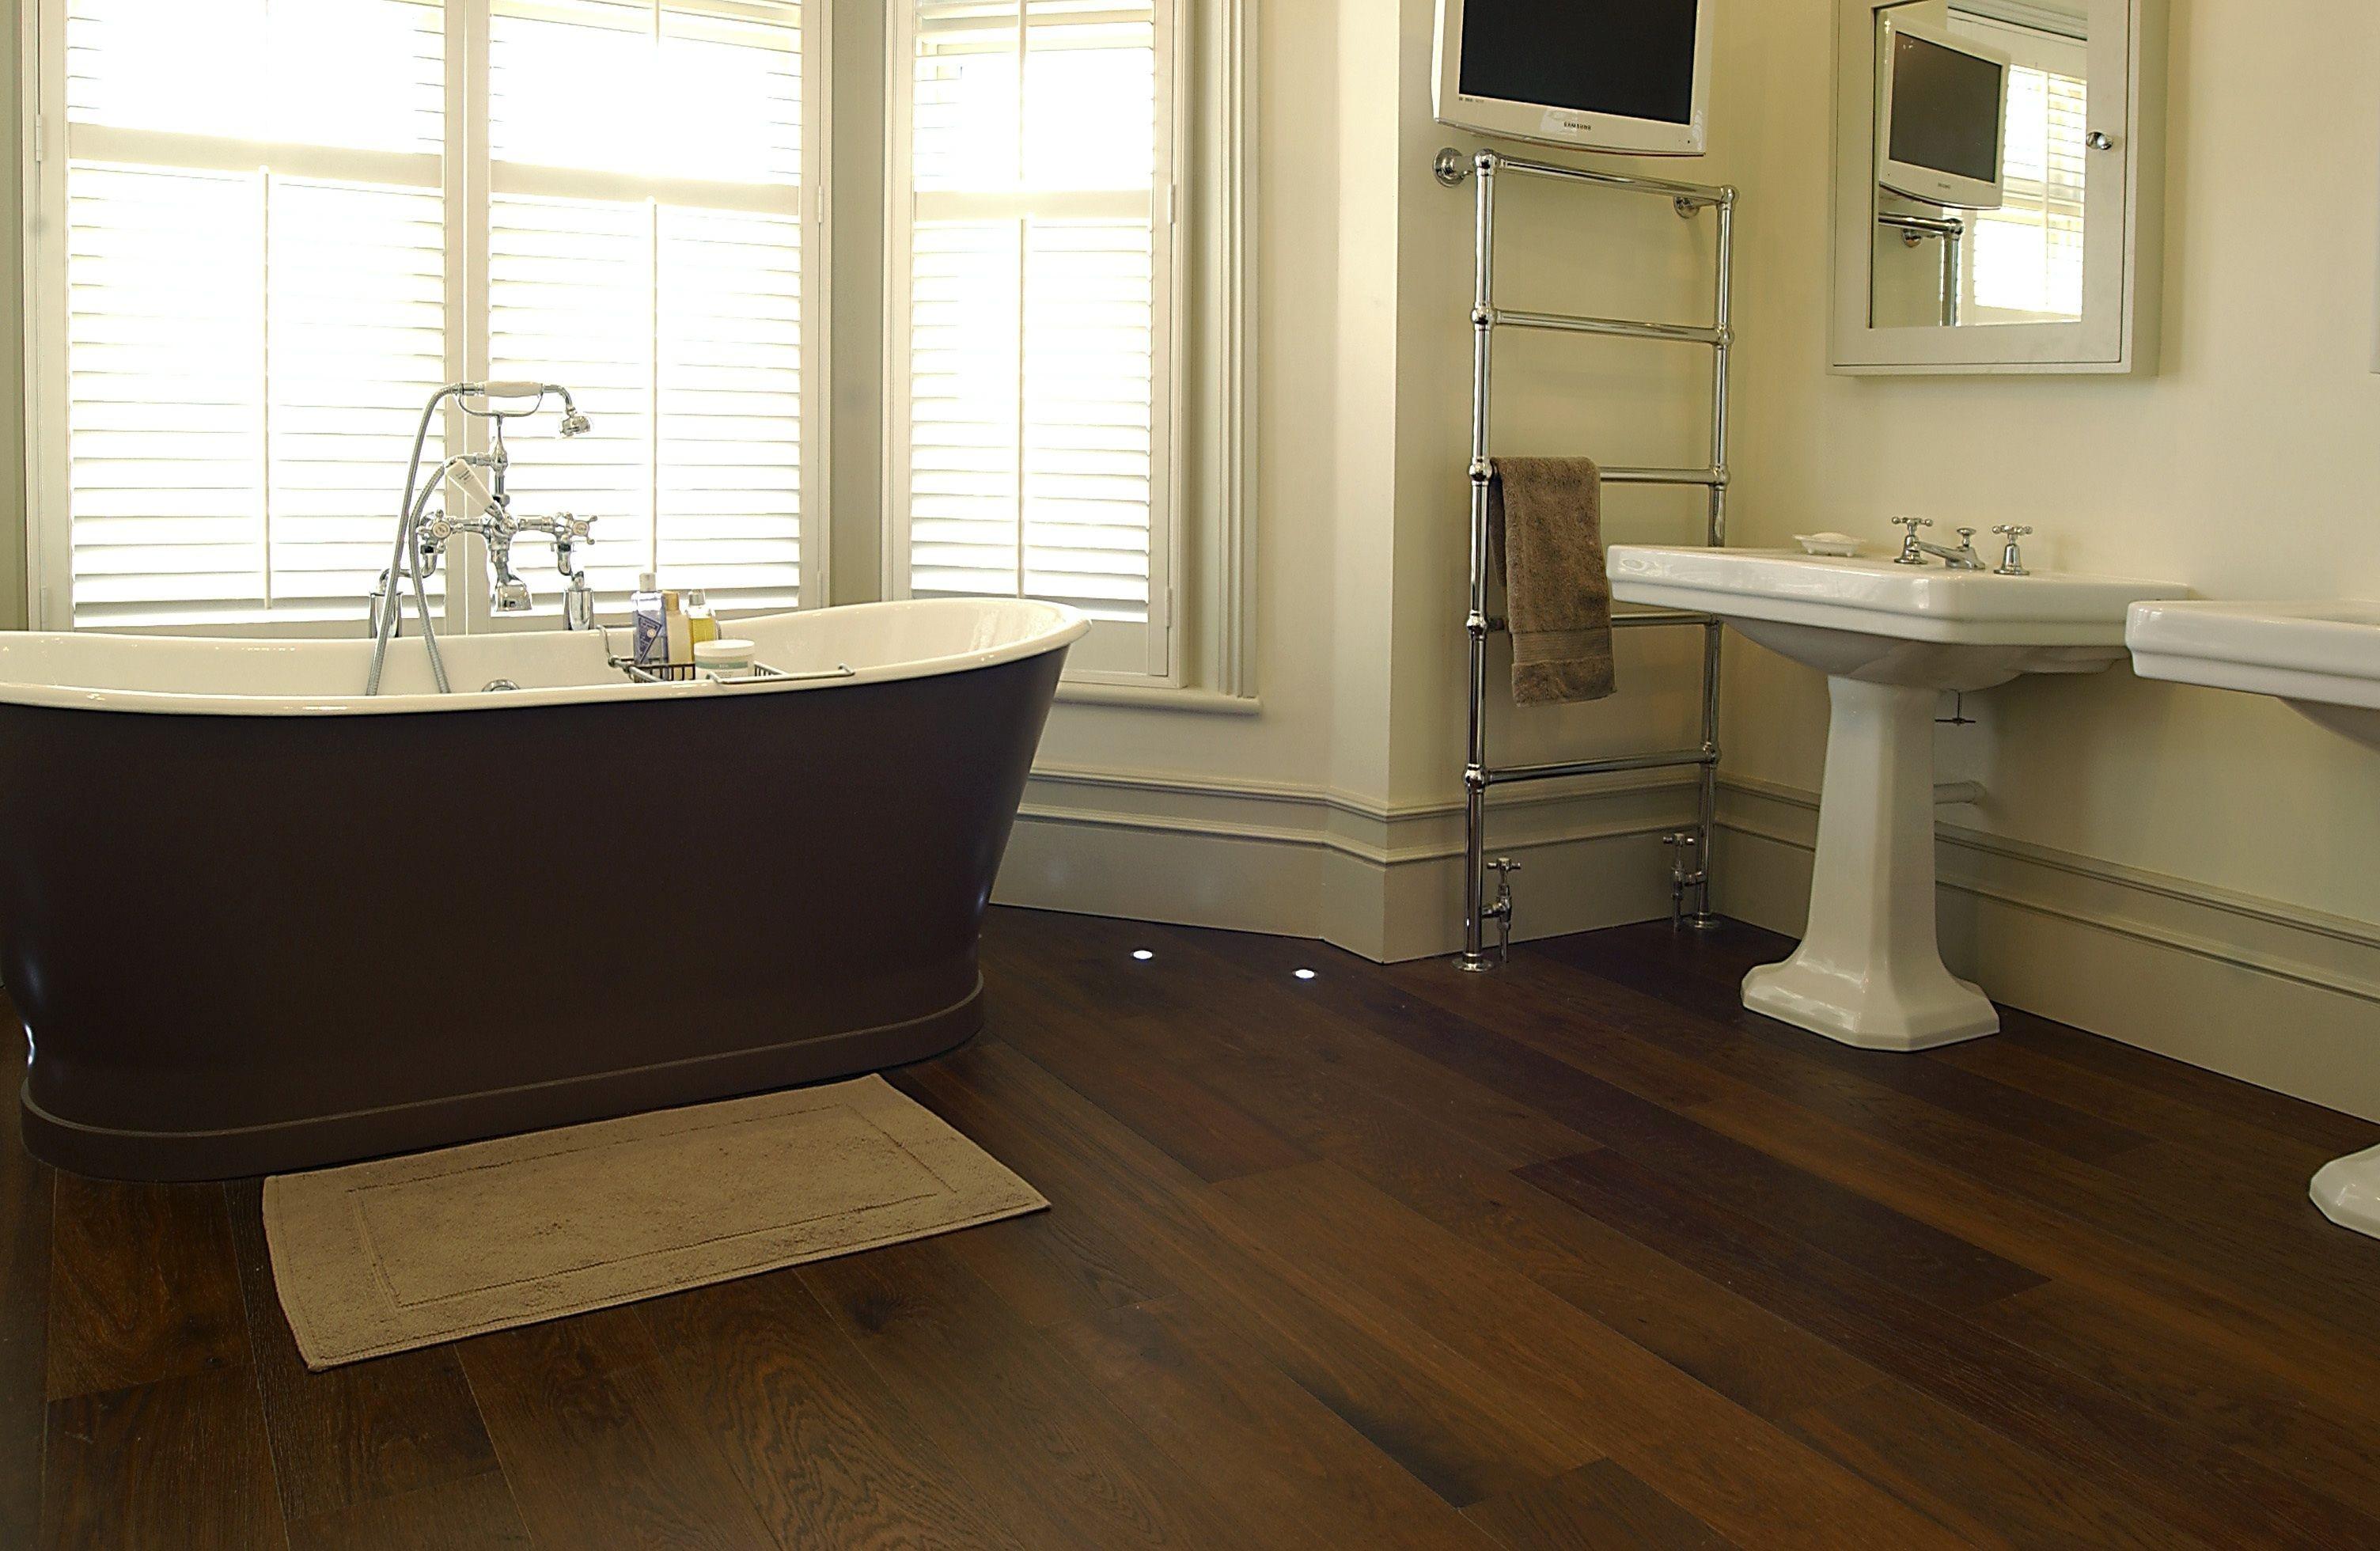 Hardwood Floors In Bathroom top Should You Install Hardwood Flooring In Your Bathroom or Not Collection